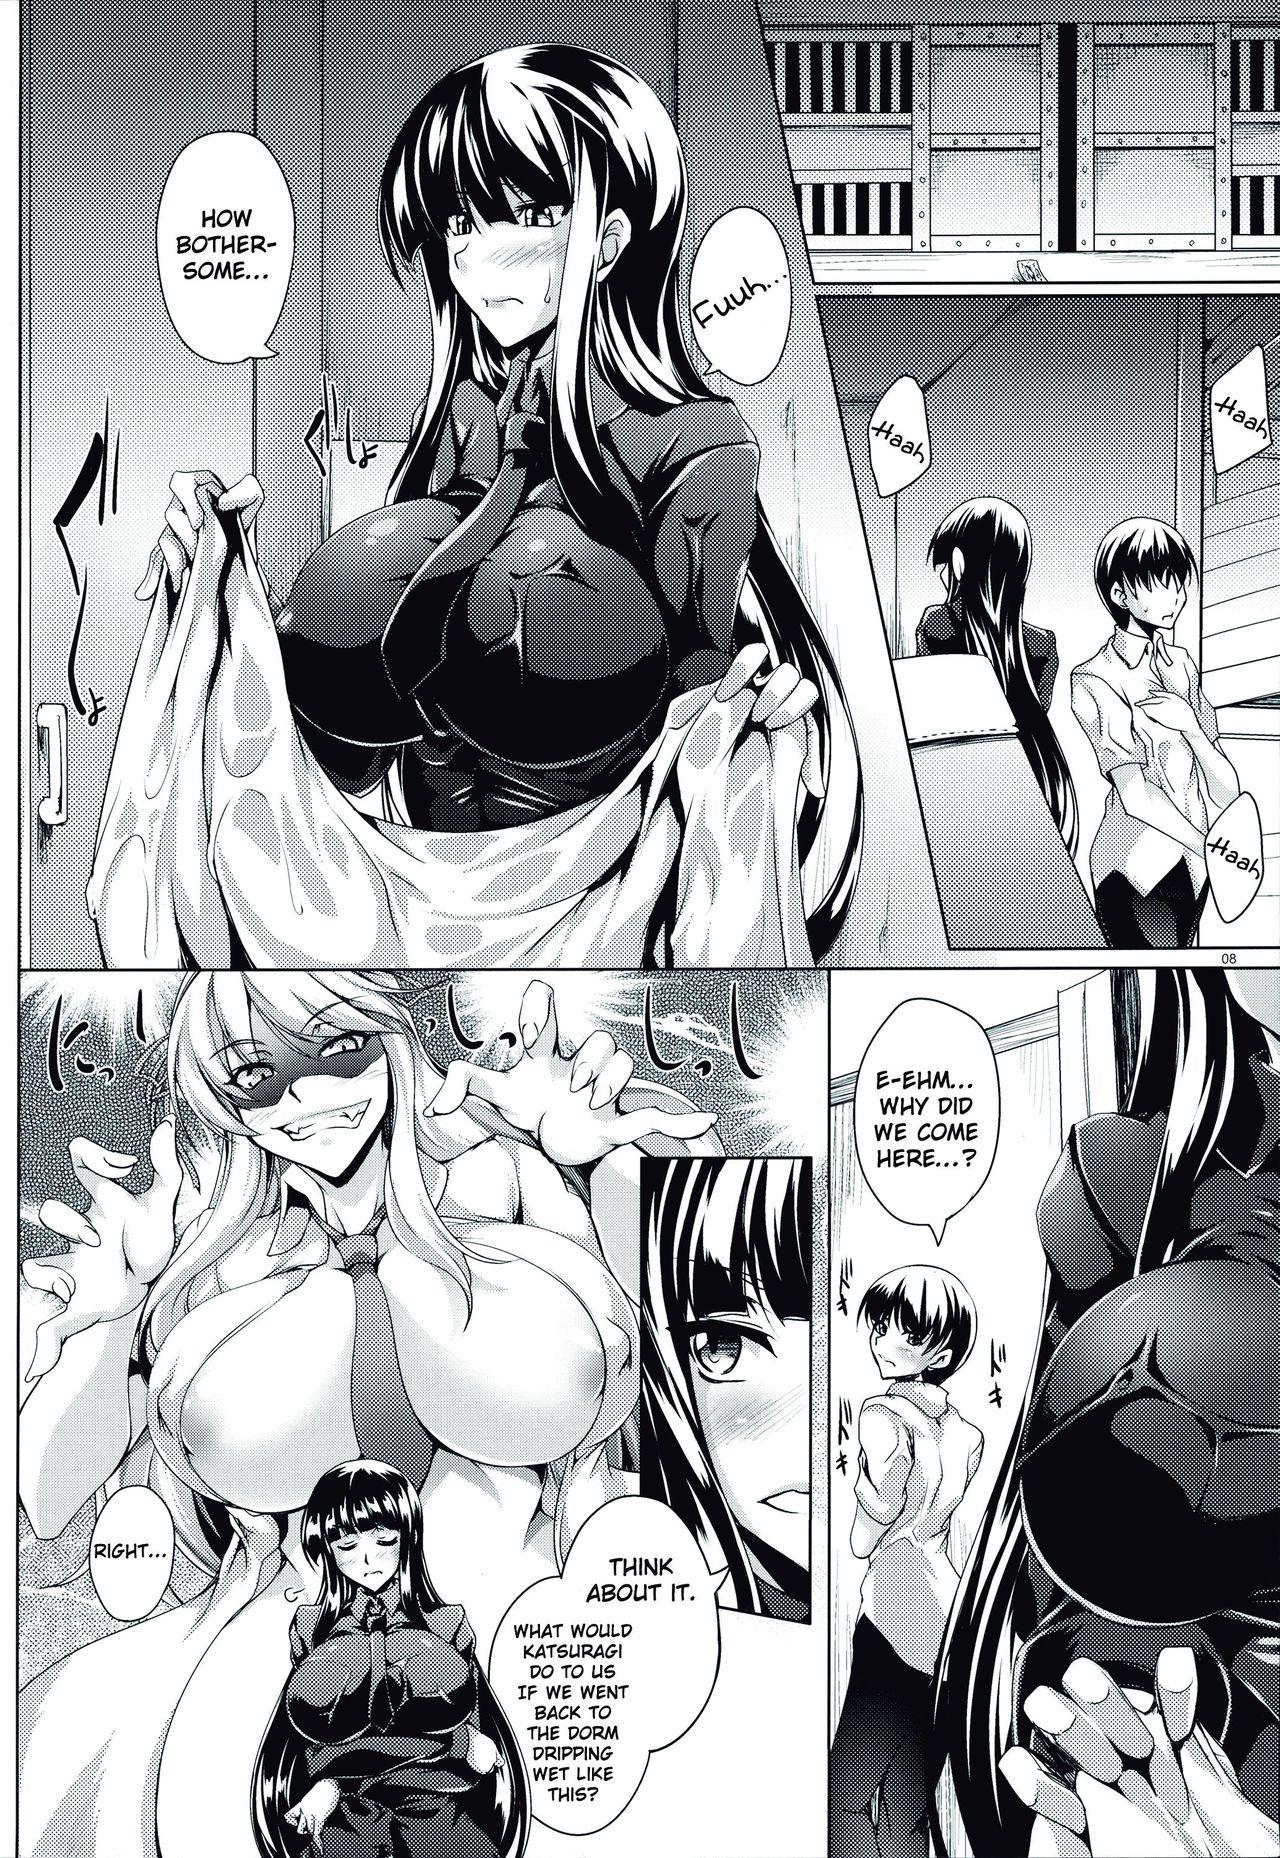 Jijoujibaku no Innocent | Innocent Caught in Her Own Trap 6